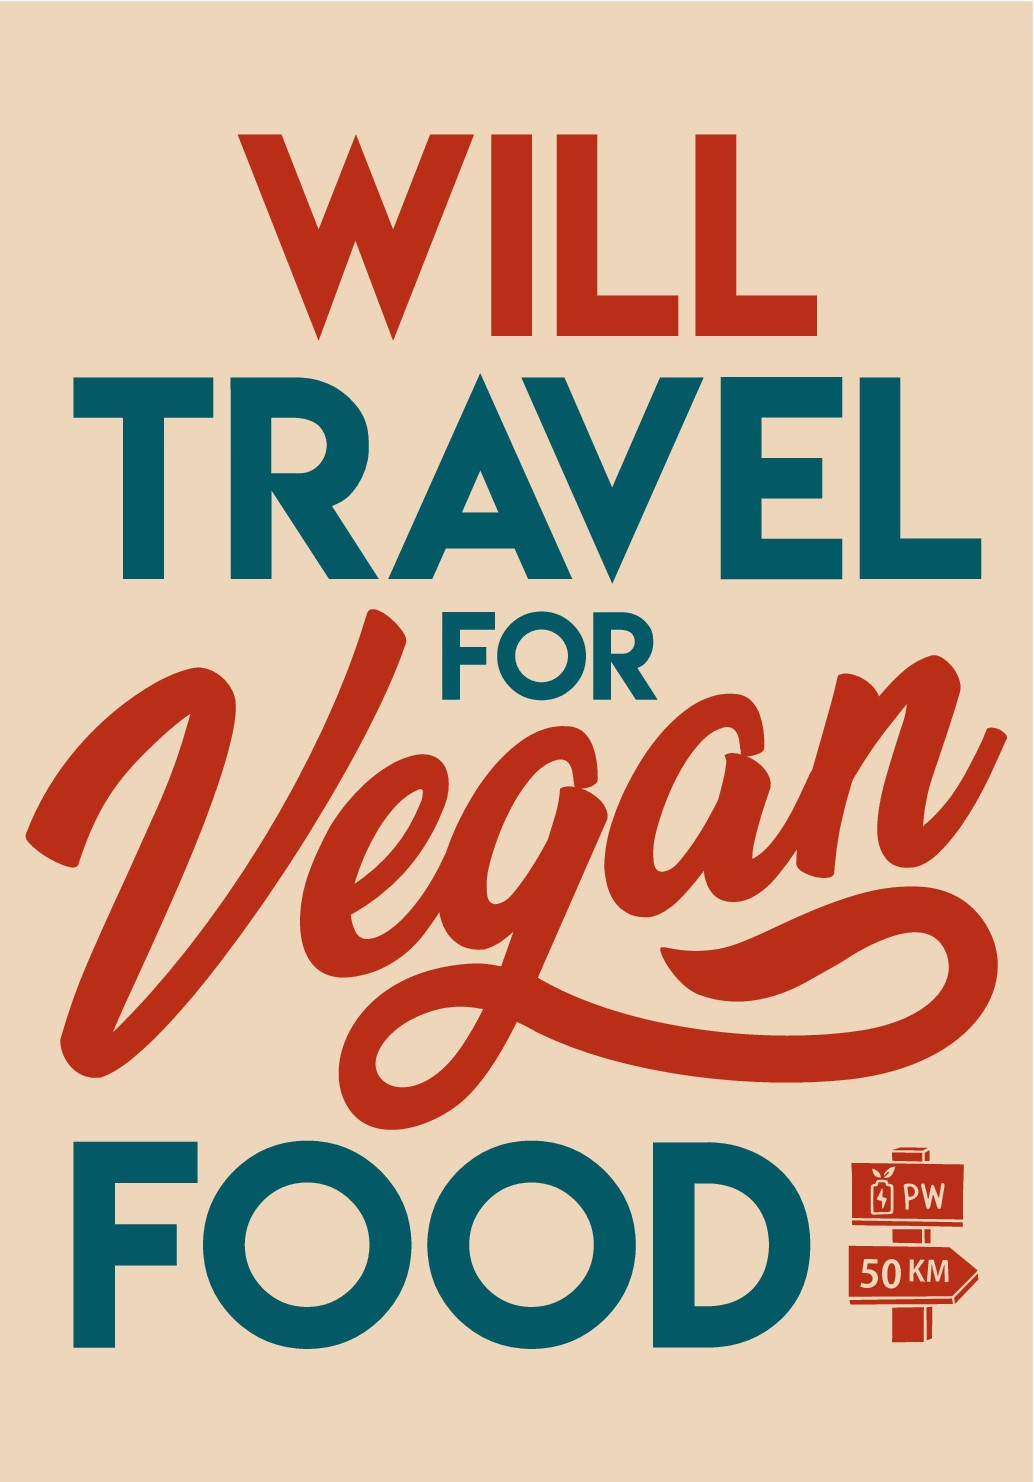 T-Shirt Design for Vegan Food Brand